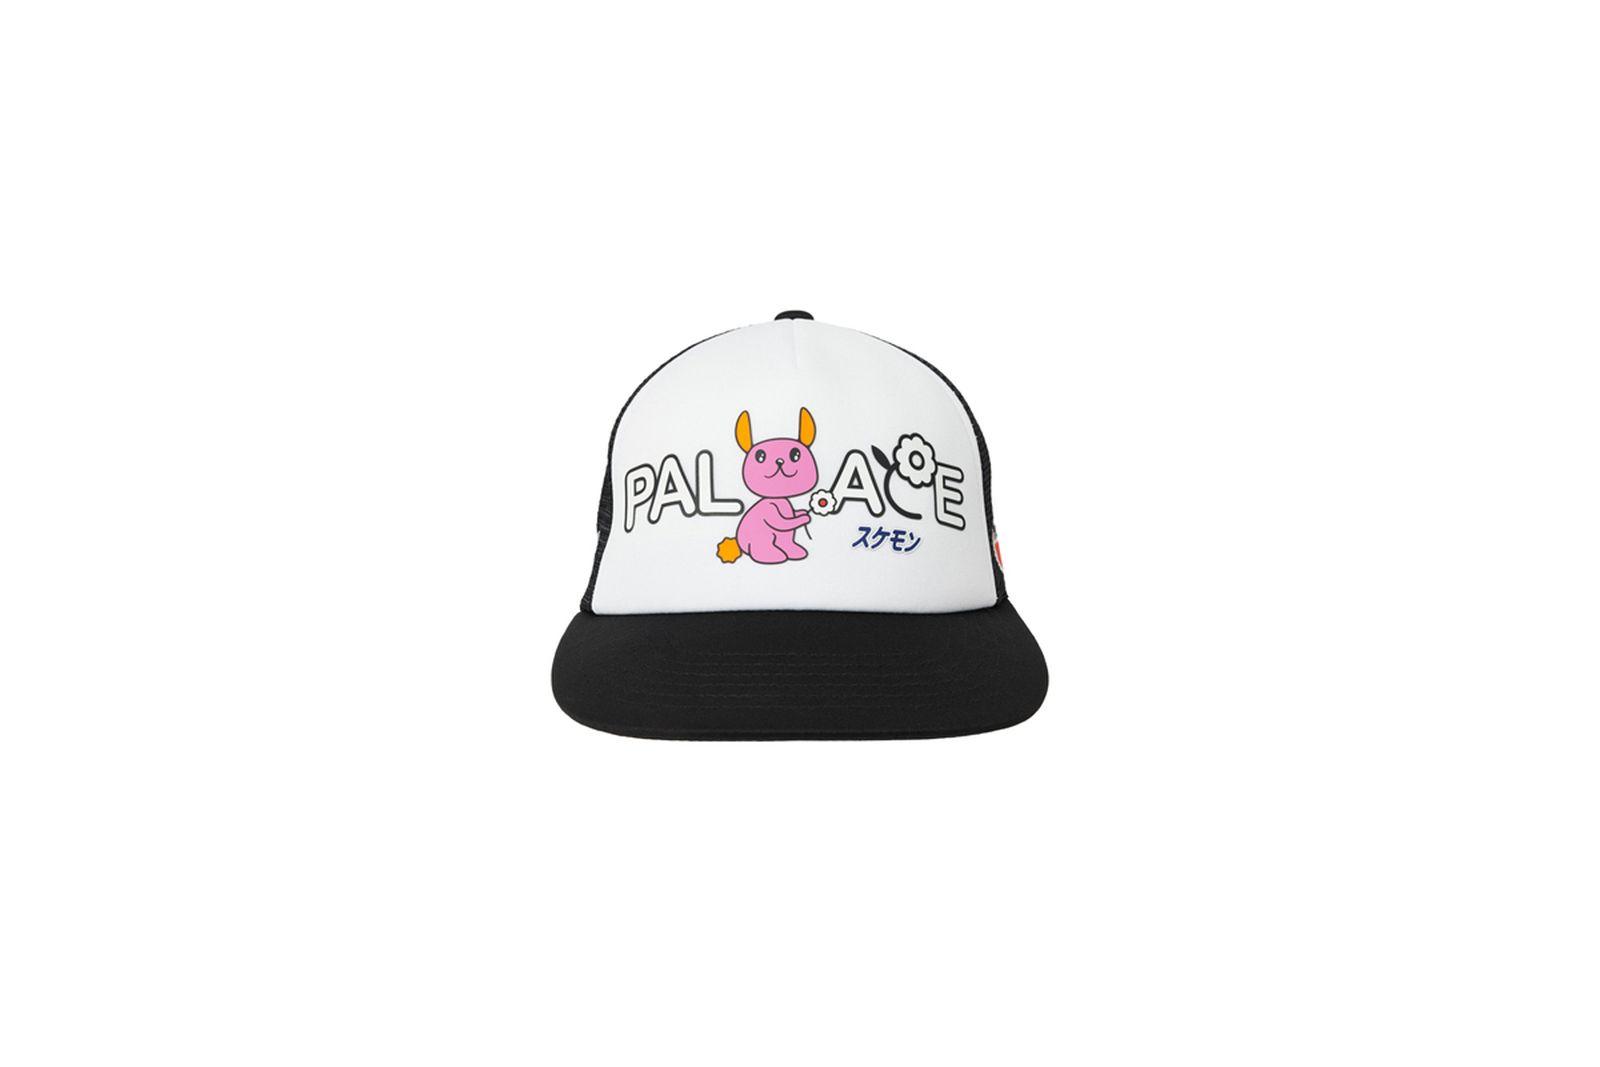 palace-summer-2021-drop-4 (6)